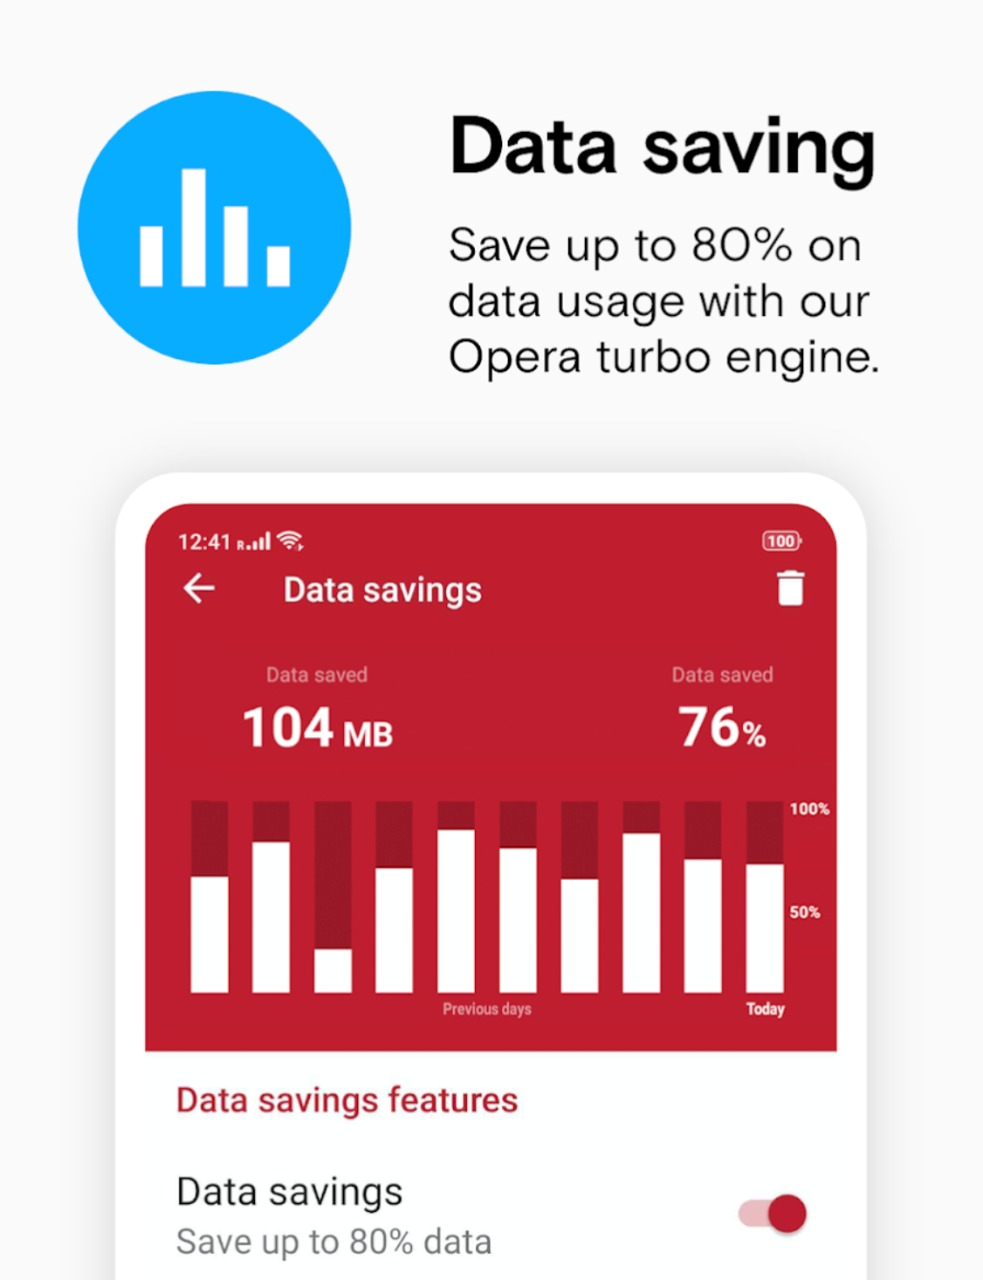 opera news hub best news app in kenya